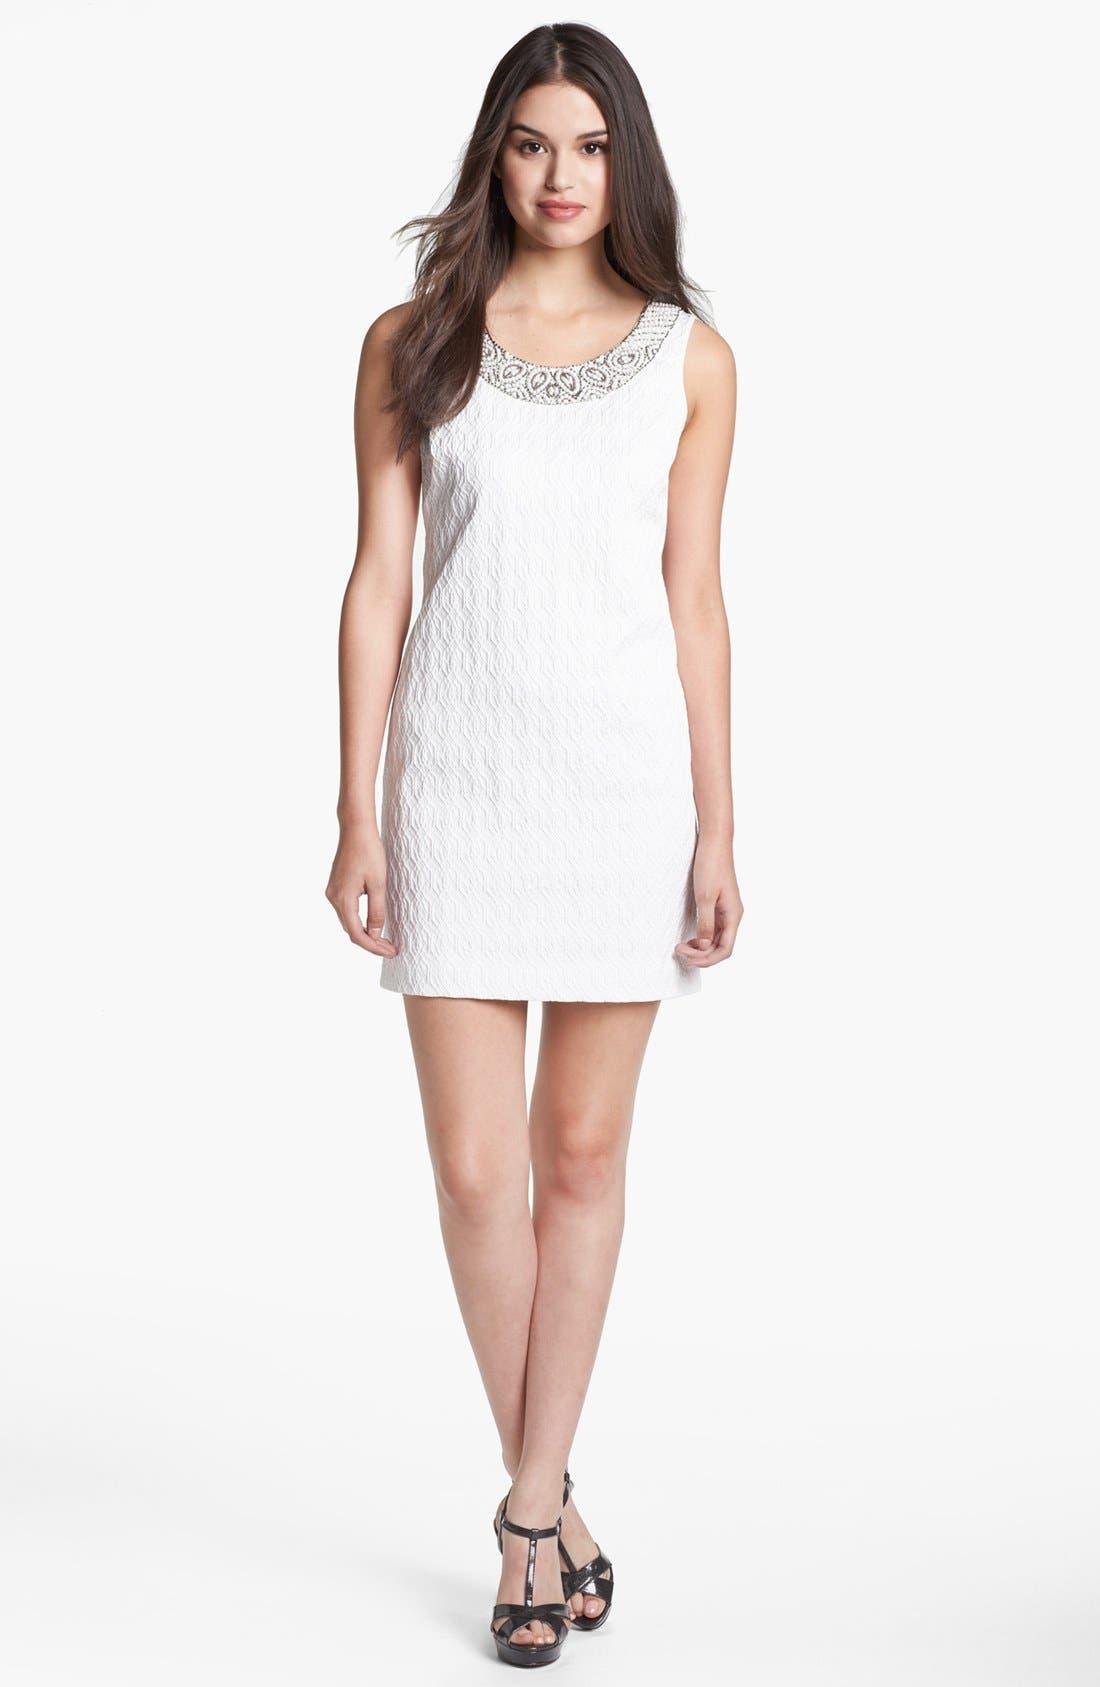 Alternate Image 1 Selected - Adrianna Papell Embellished Jacquard Shift Dress (Petite)